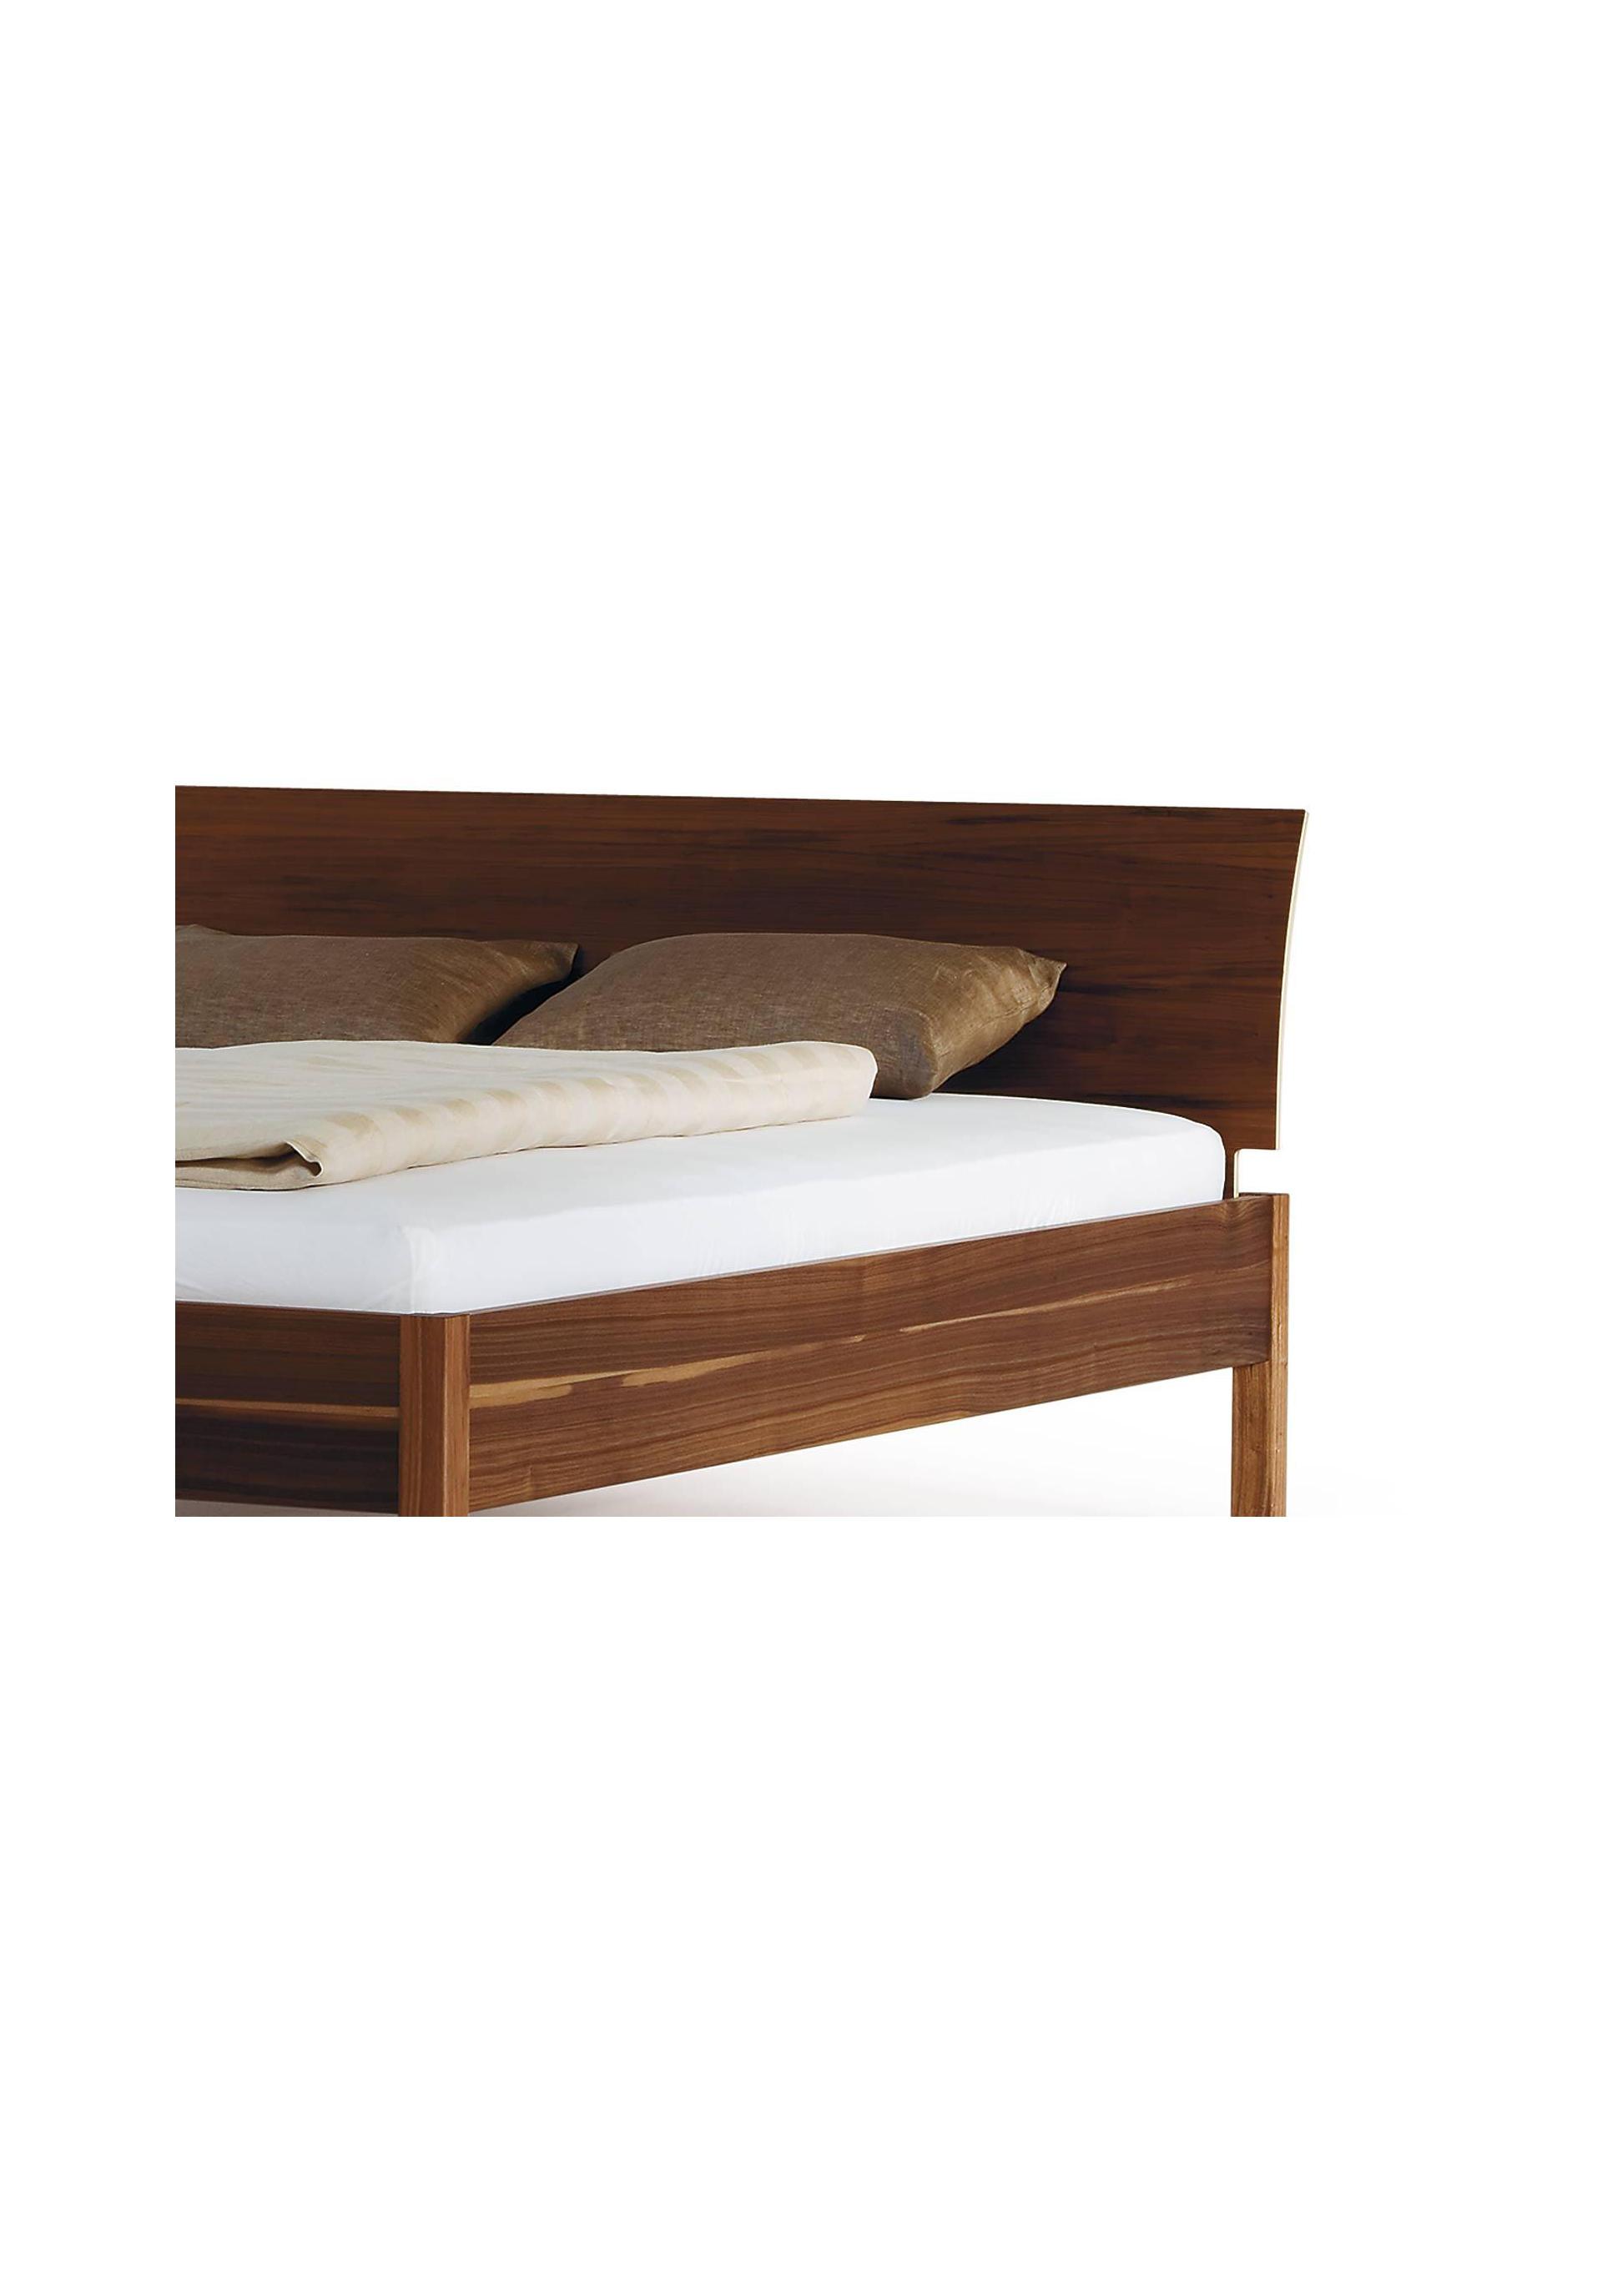 bett basic inkl r ckenlehne hessnatur deutschland. Black Bedroom Furniture Sets. Home Design Ideas